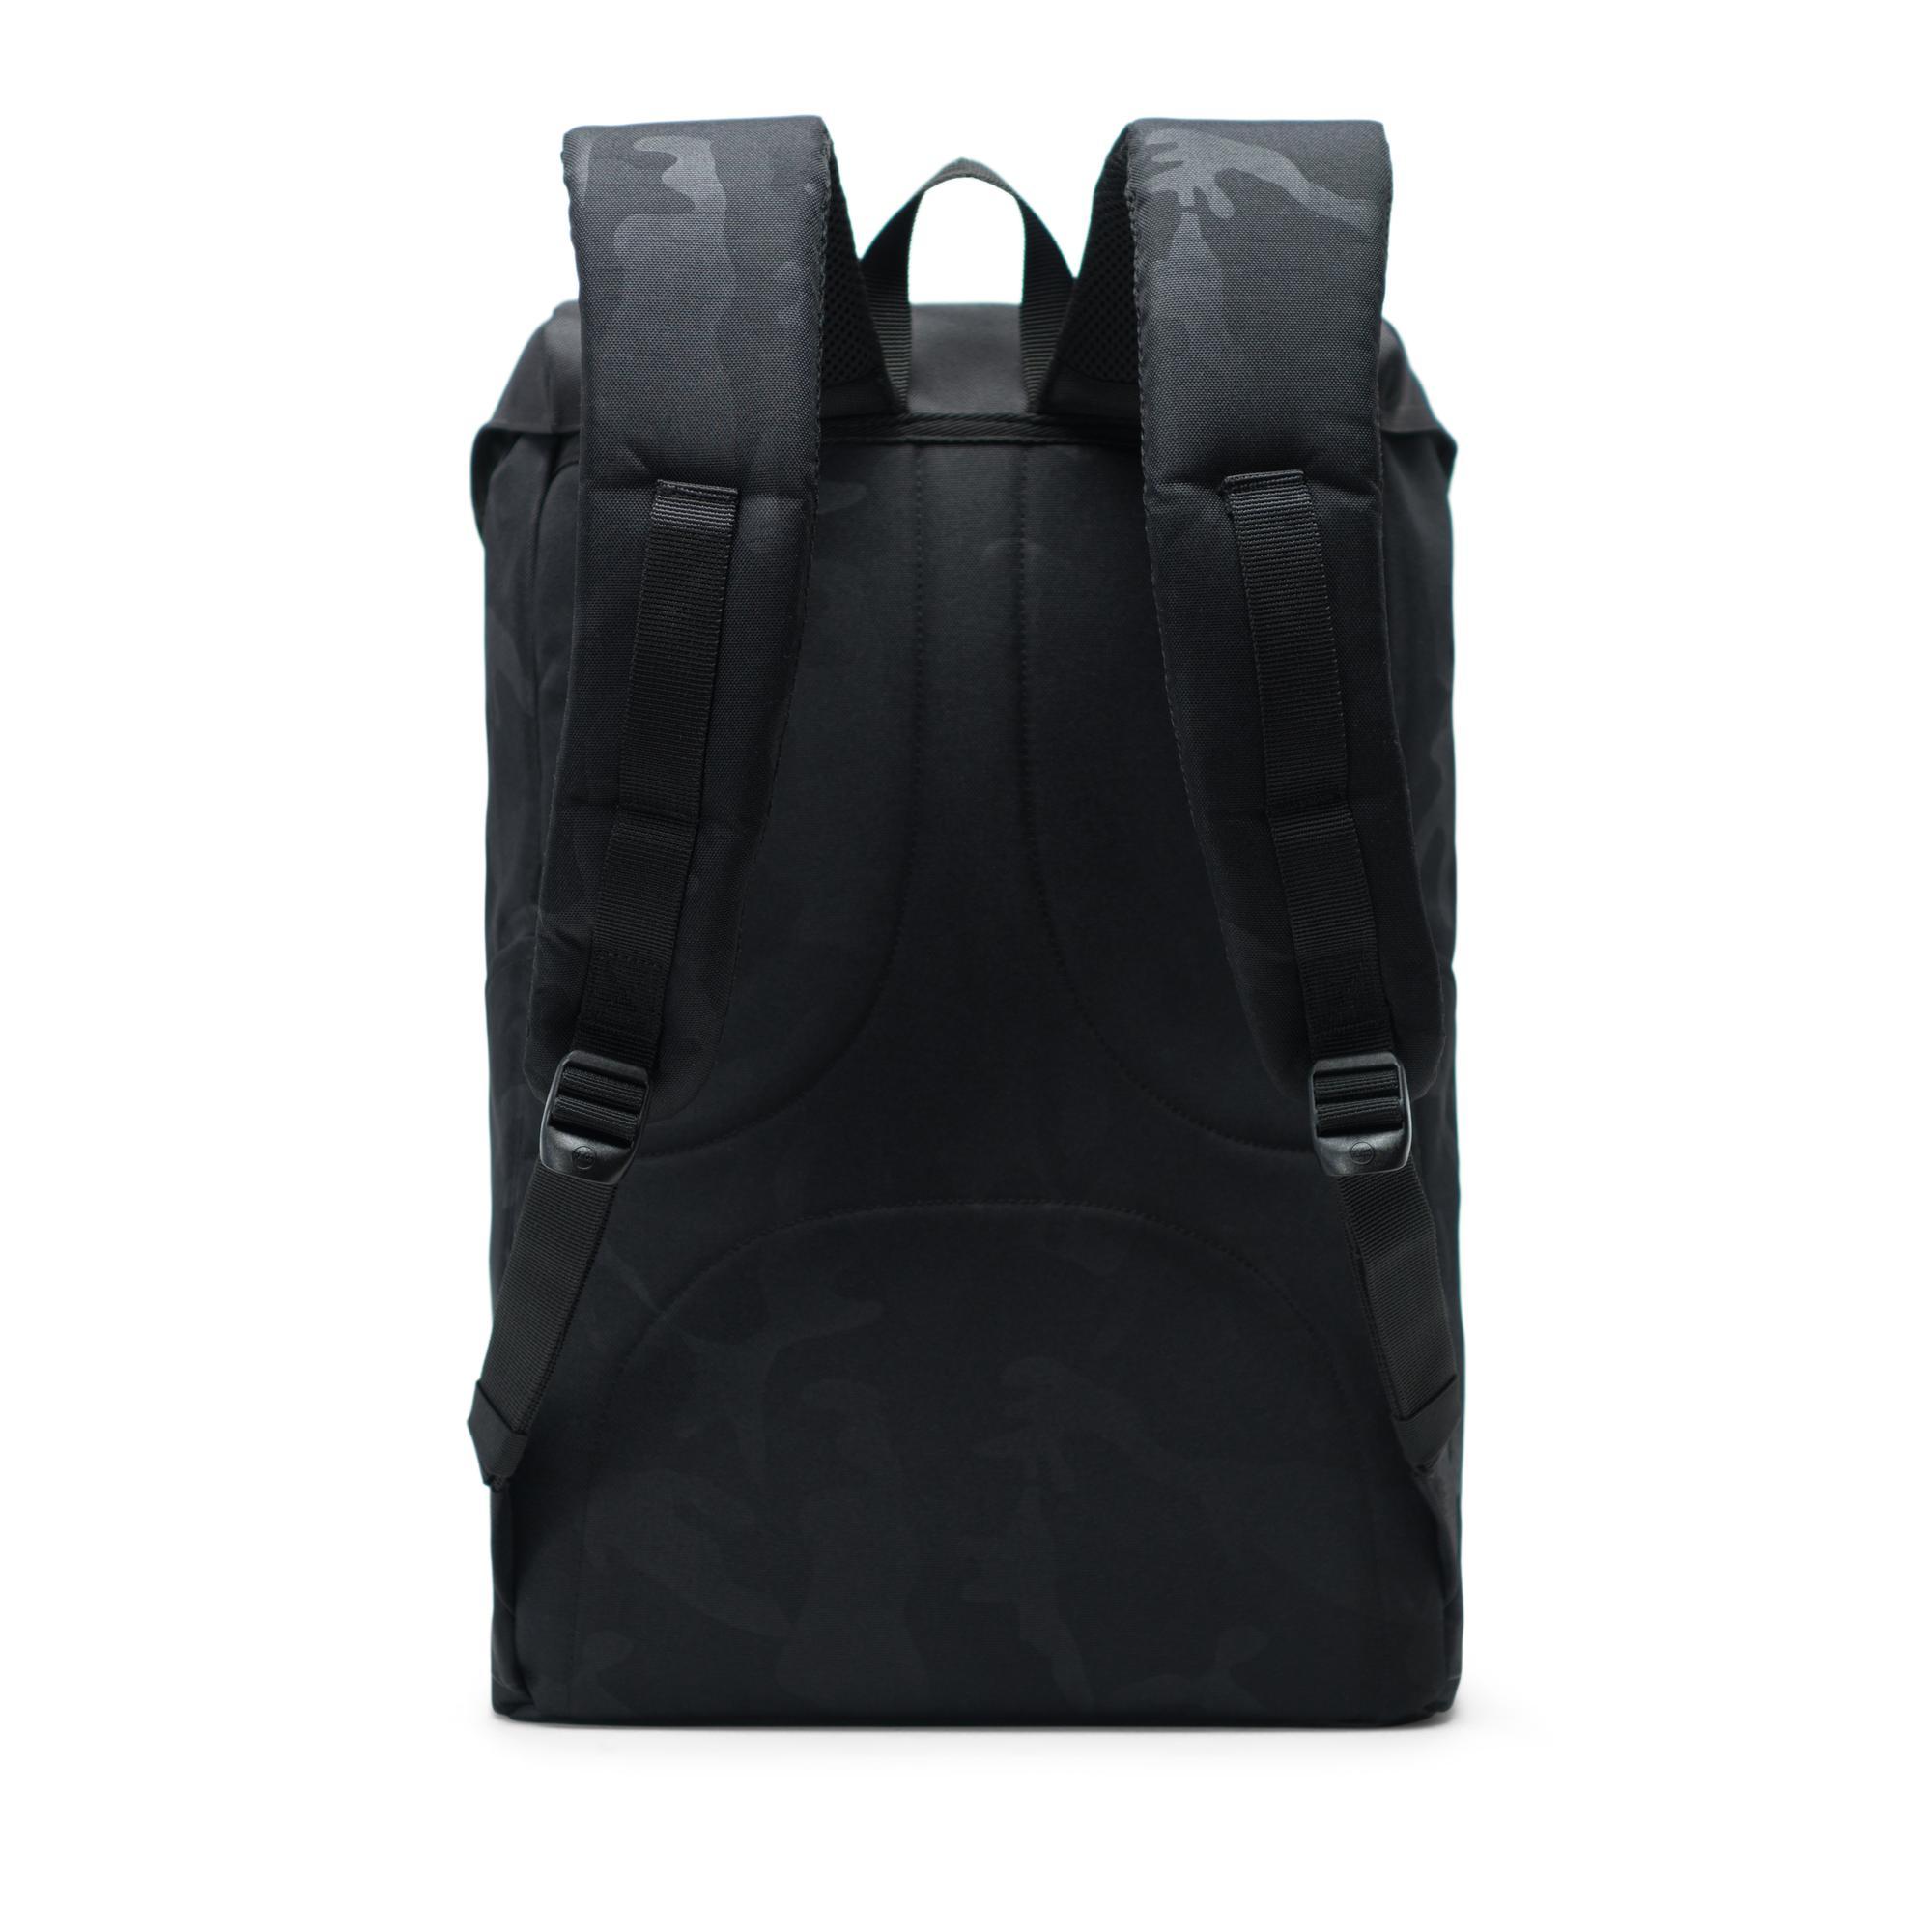 976eeedcc96 Buckingham Backpack Delta